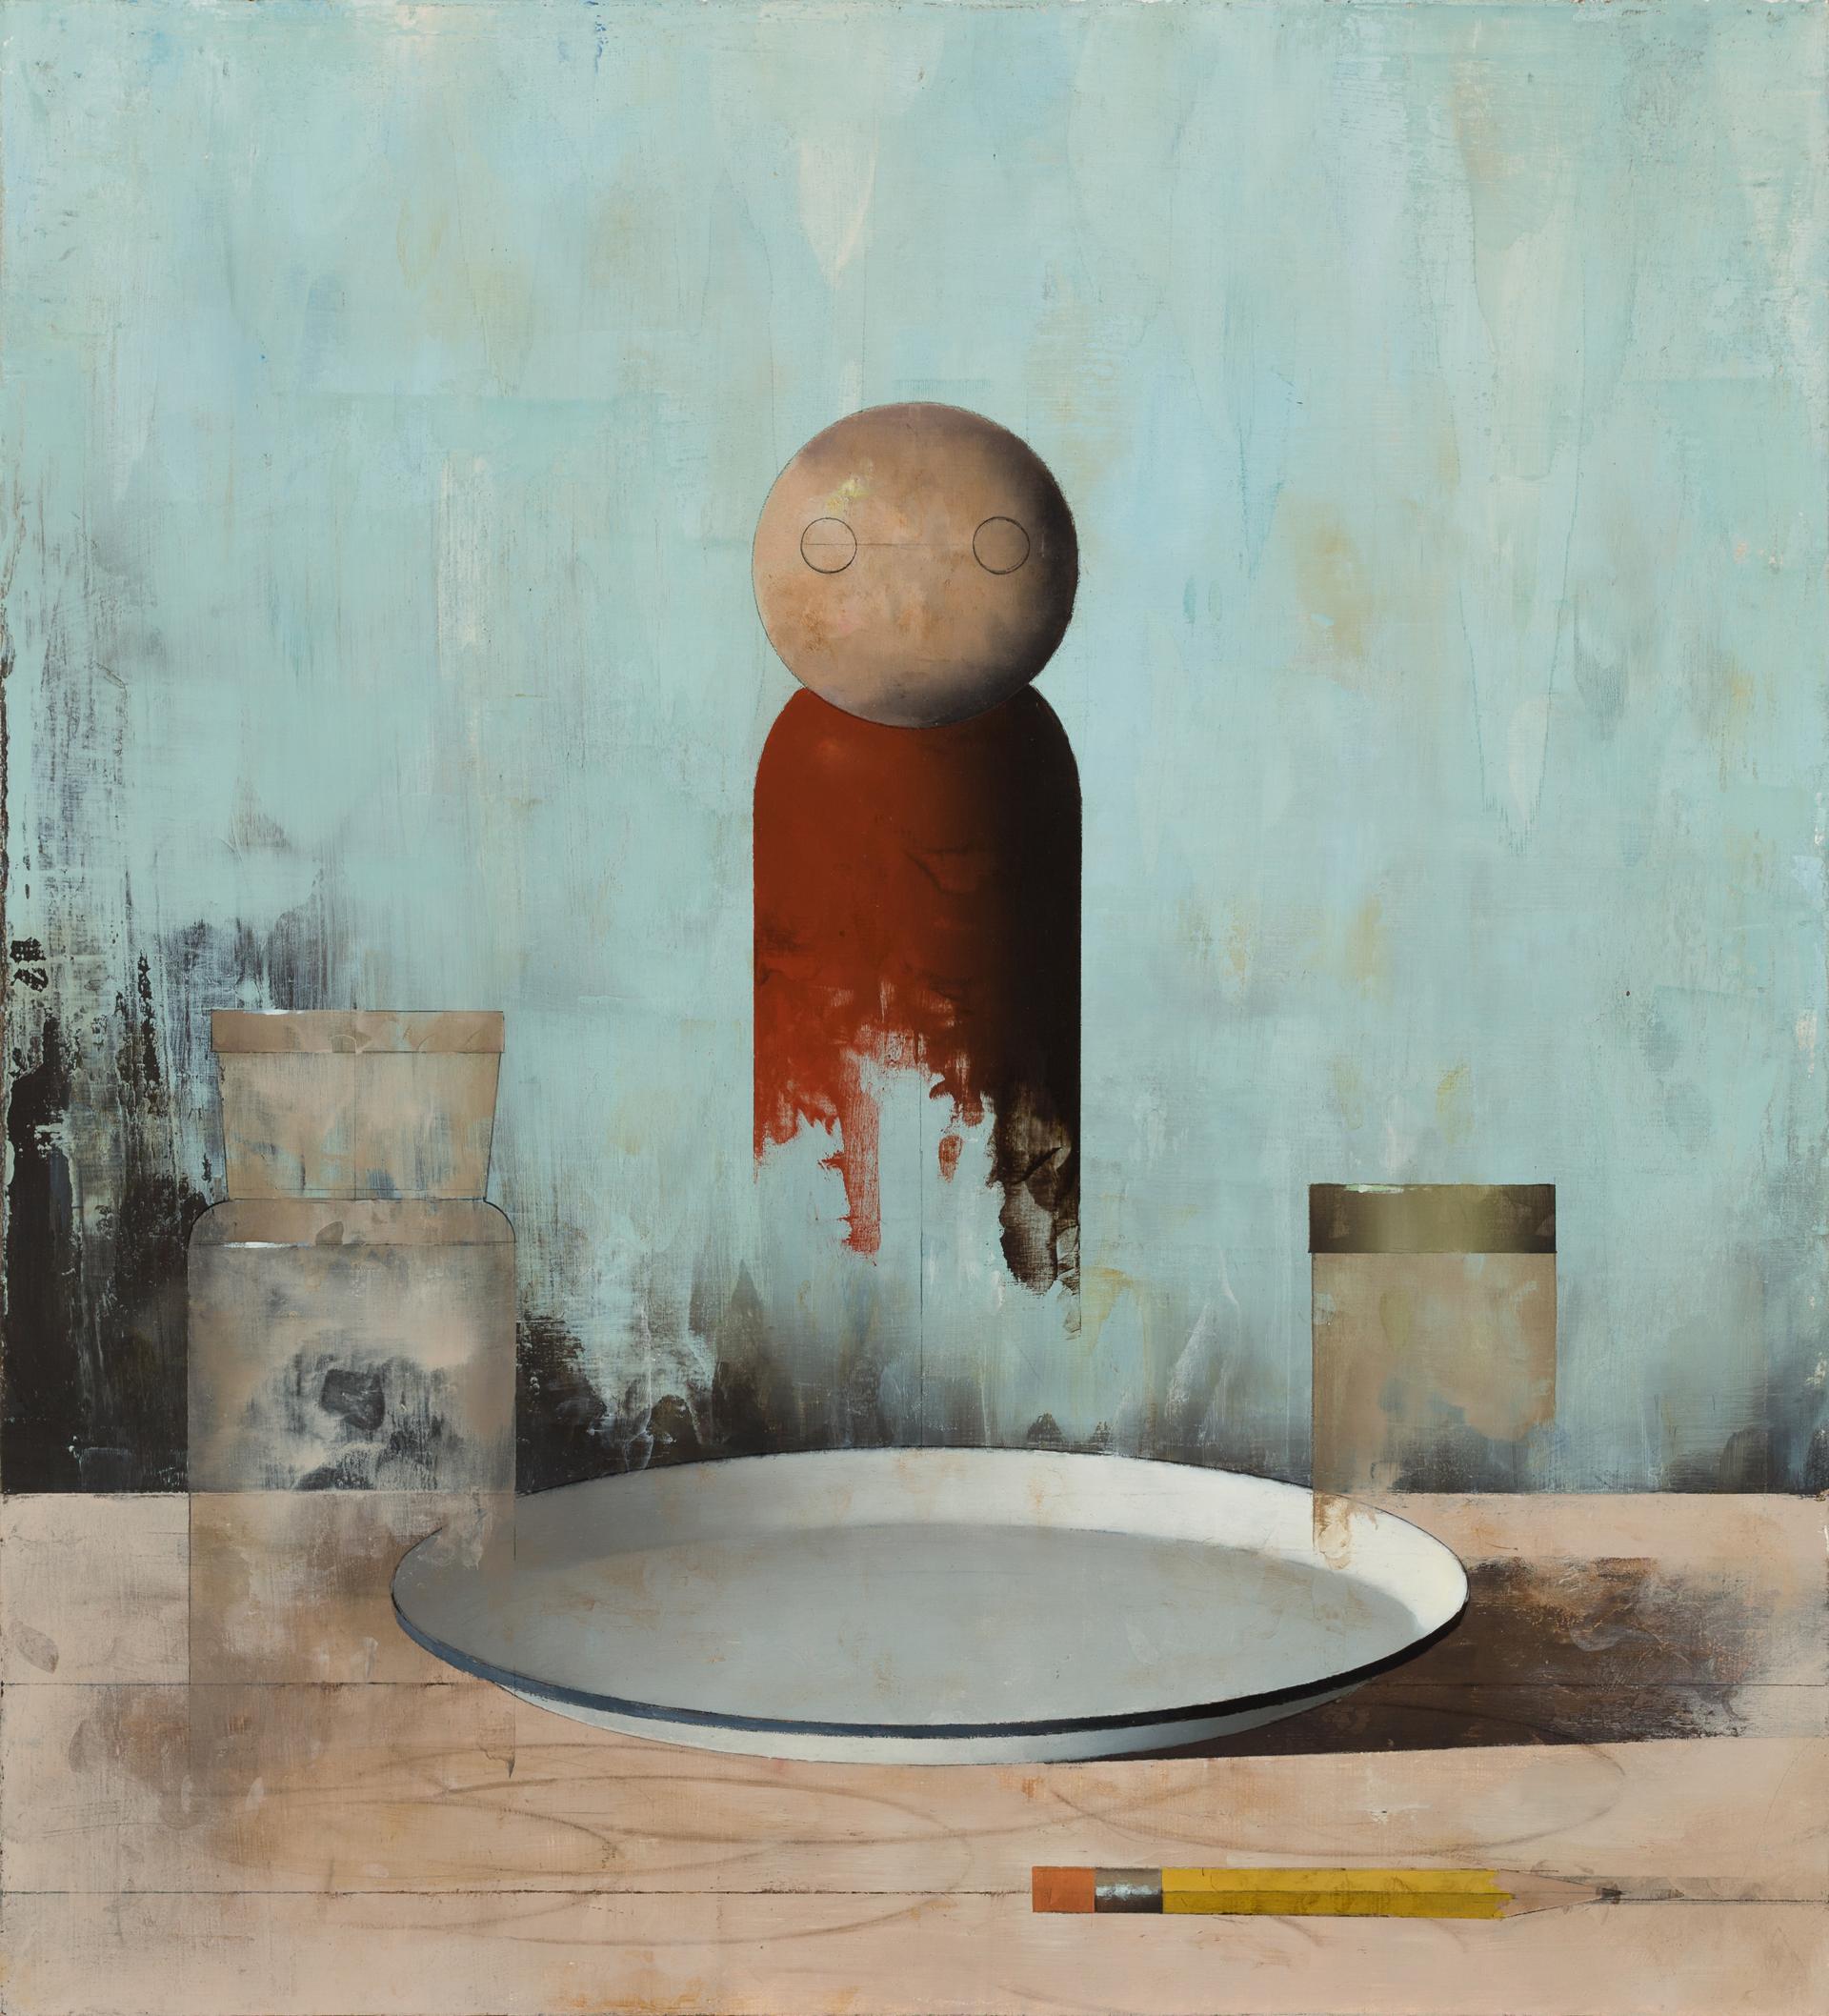 Little Apparition by Matthew Saba